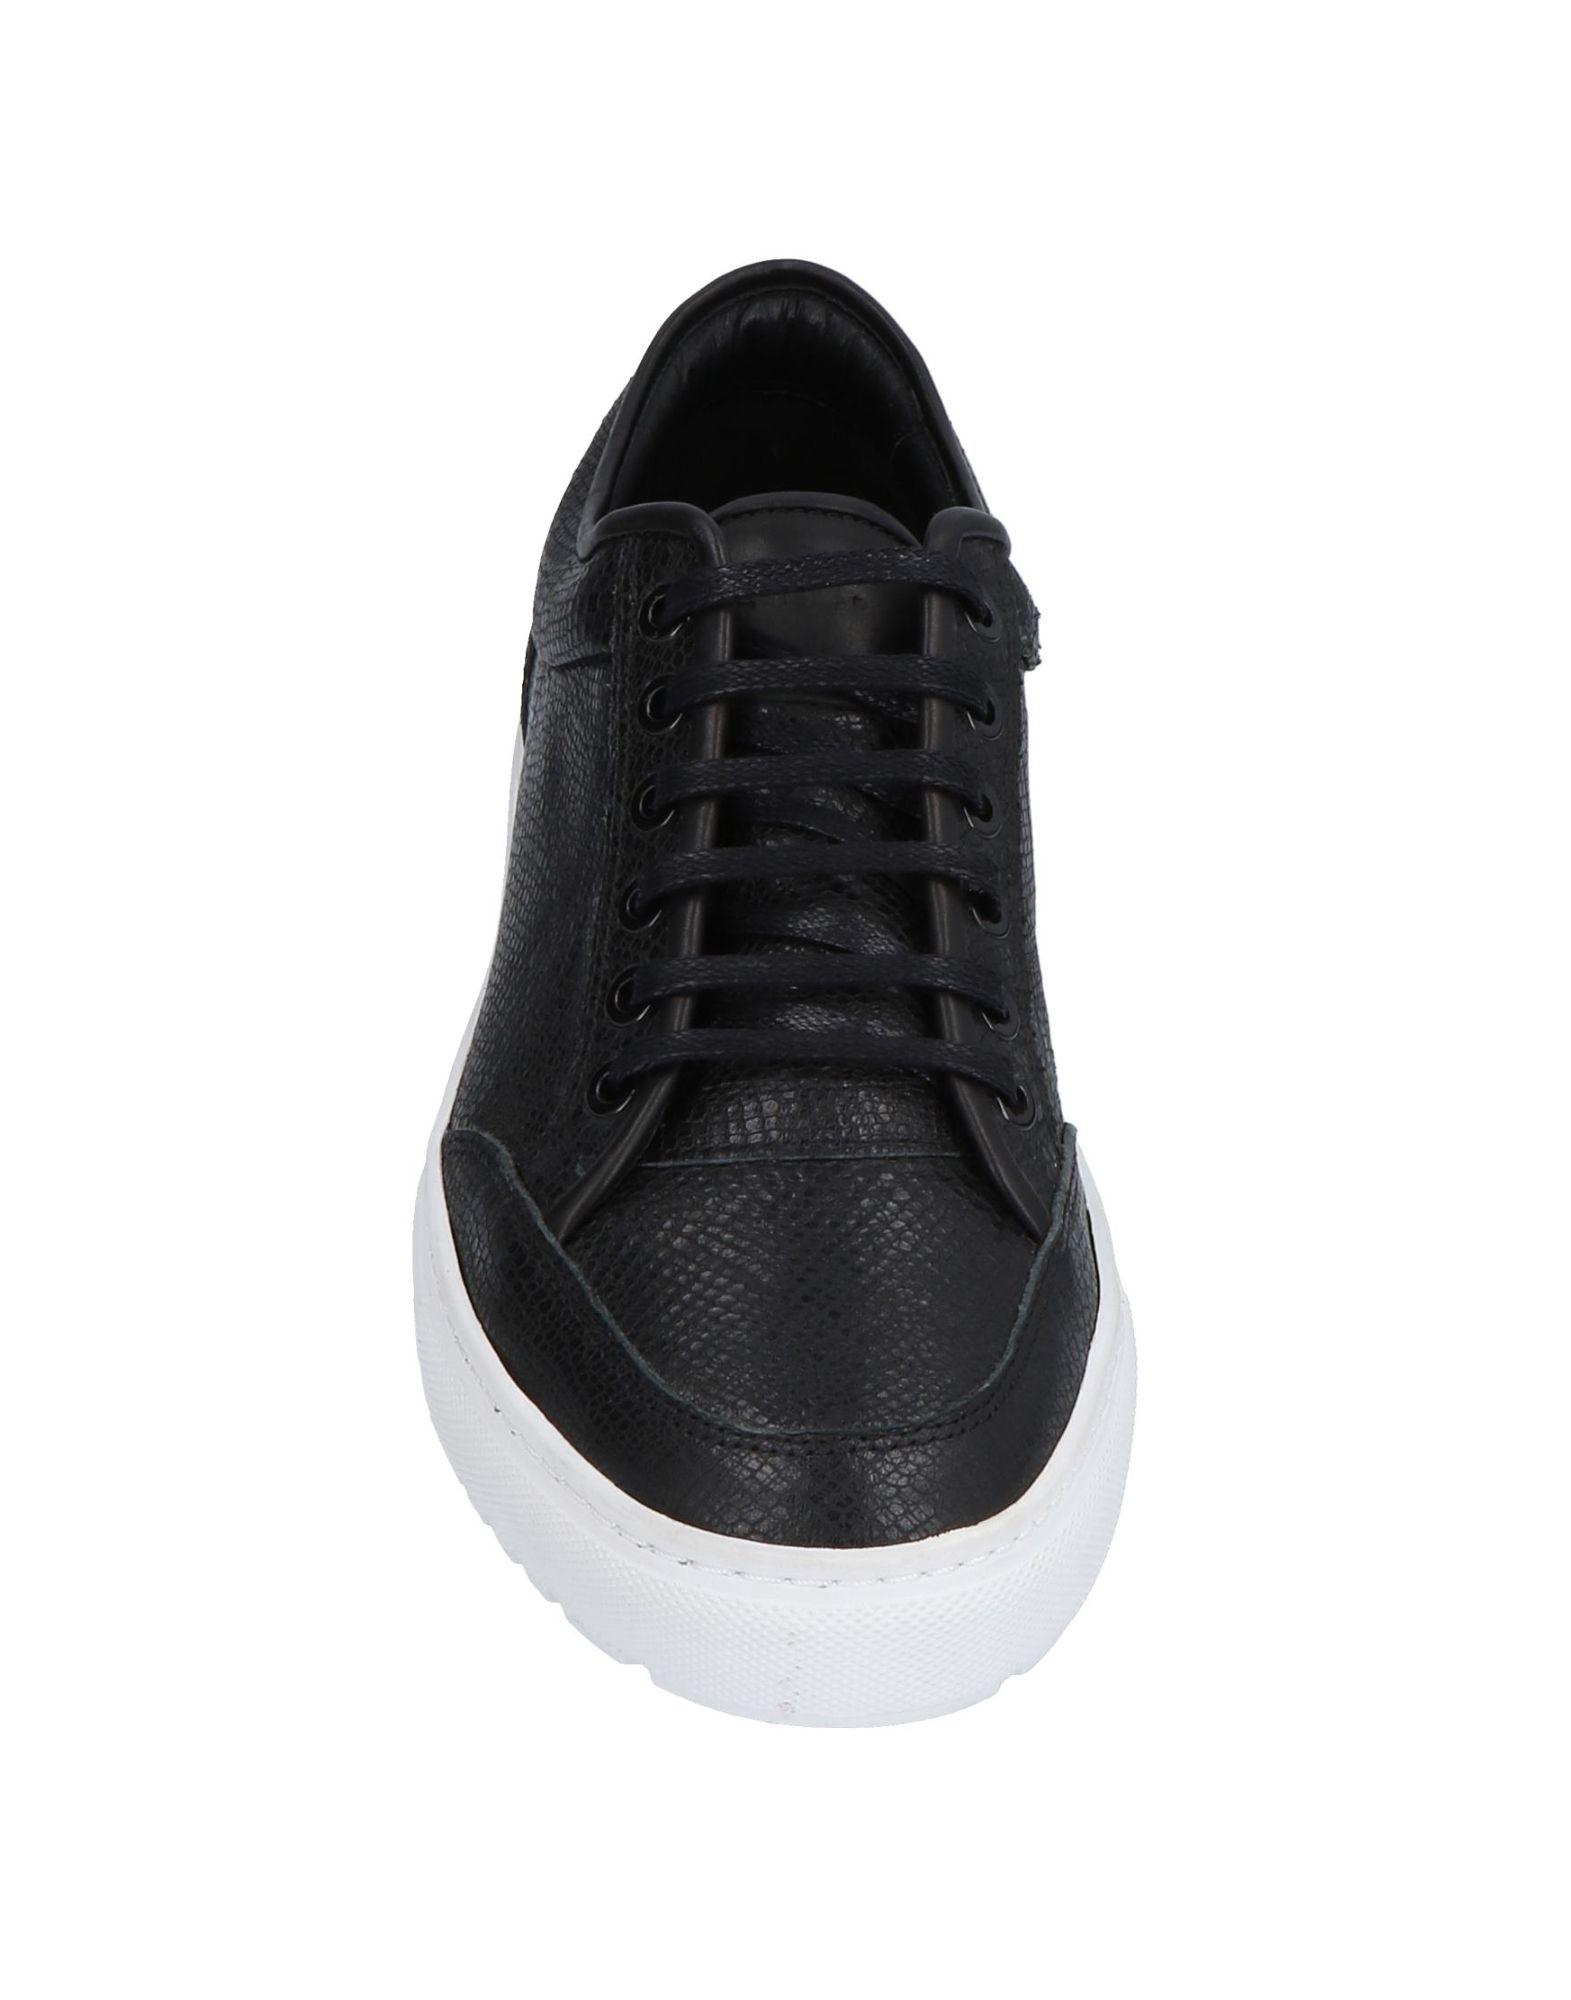 Etq Amsterdam Herren Sneakers Herren Amsterdam  11488123PP Gute Qualität beliebte Schuhe cb2d39